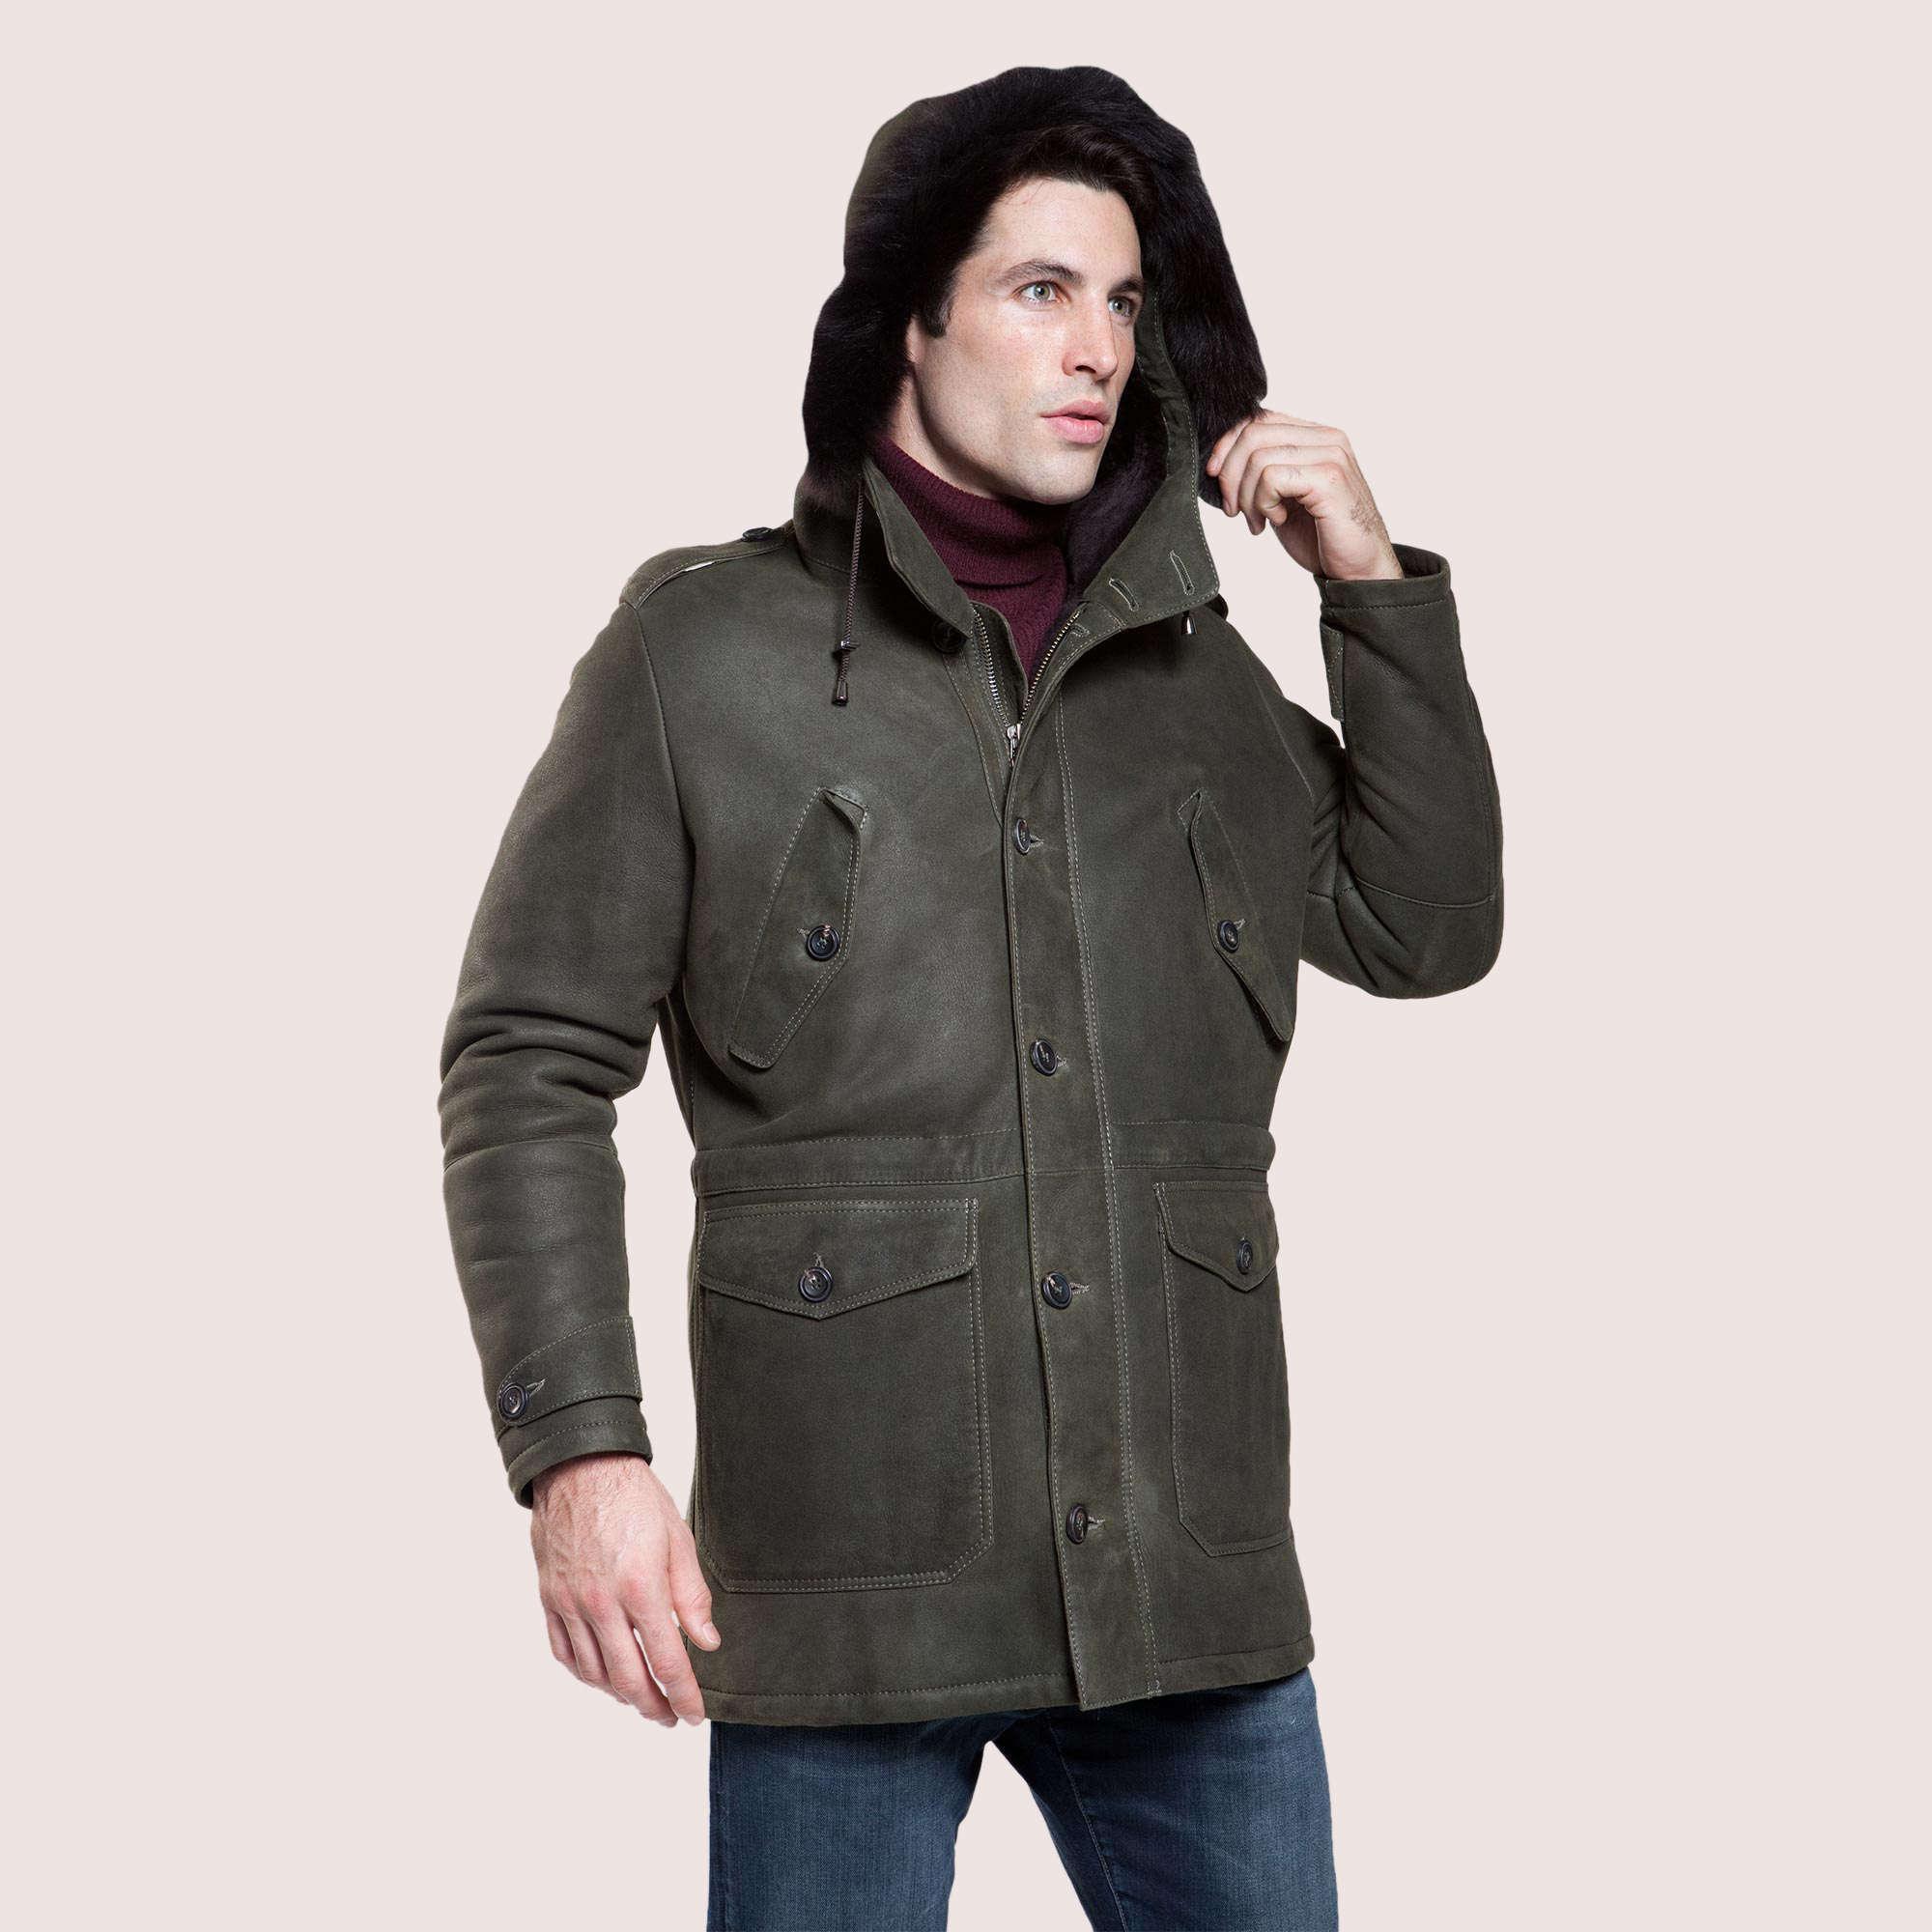 Greenwood Shearling Coat